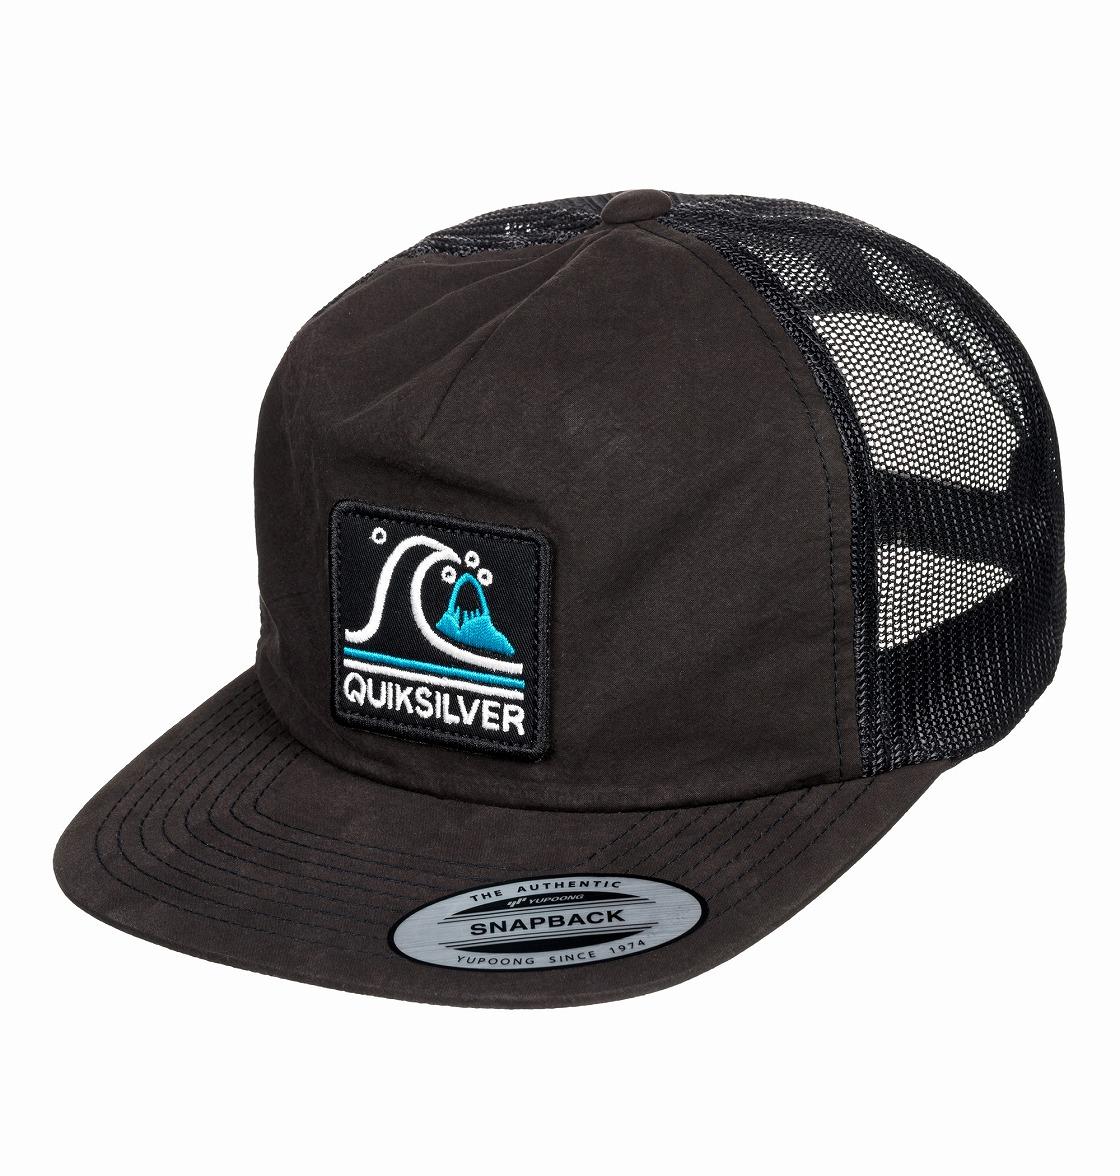 QUIKSILVER クイックシルバー 公式通販 1~3営業日以内に発送 アウトレット価格 帽子 EARTH 全国一律送料無料 キャップ 大好評です Quiksilver BROTHER